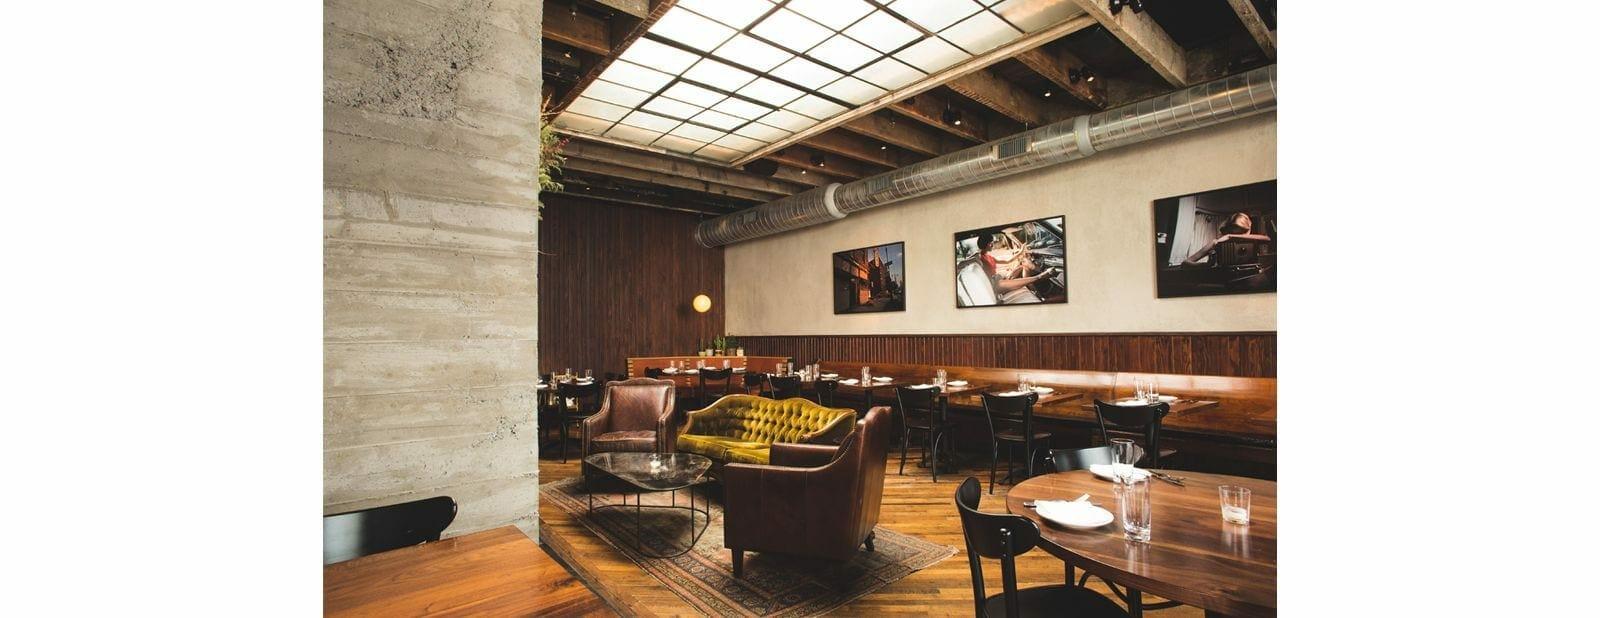 wm-mulherins-dining-room